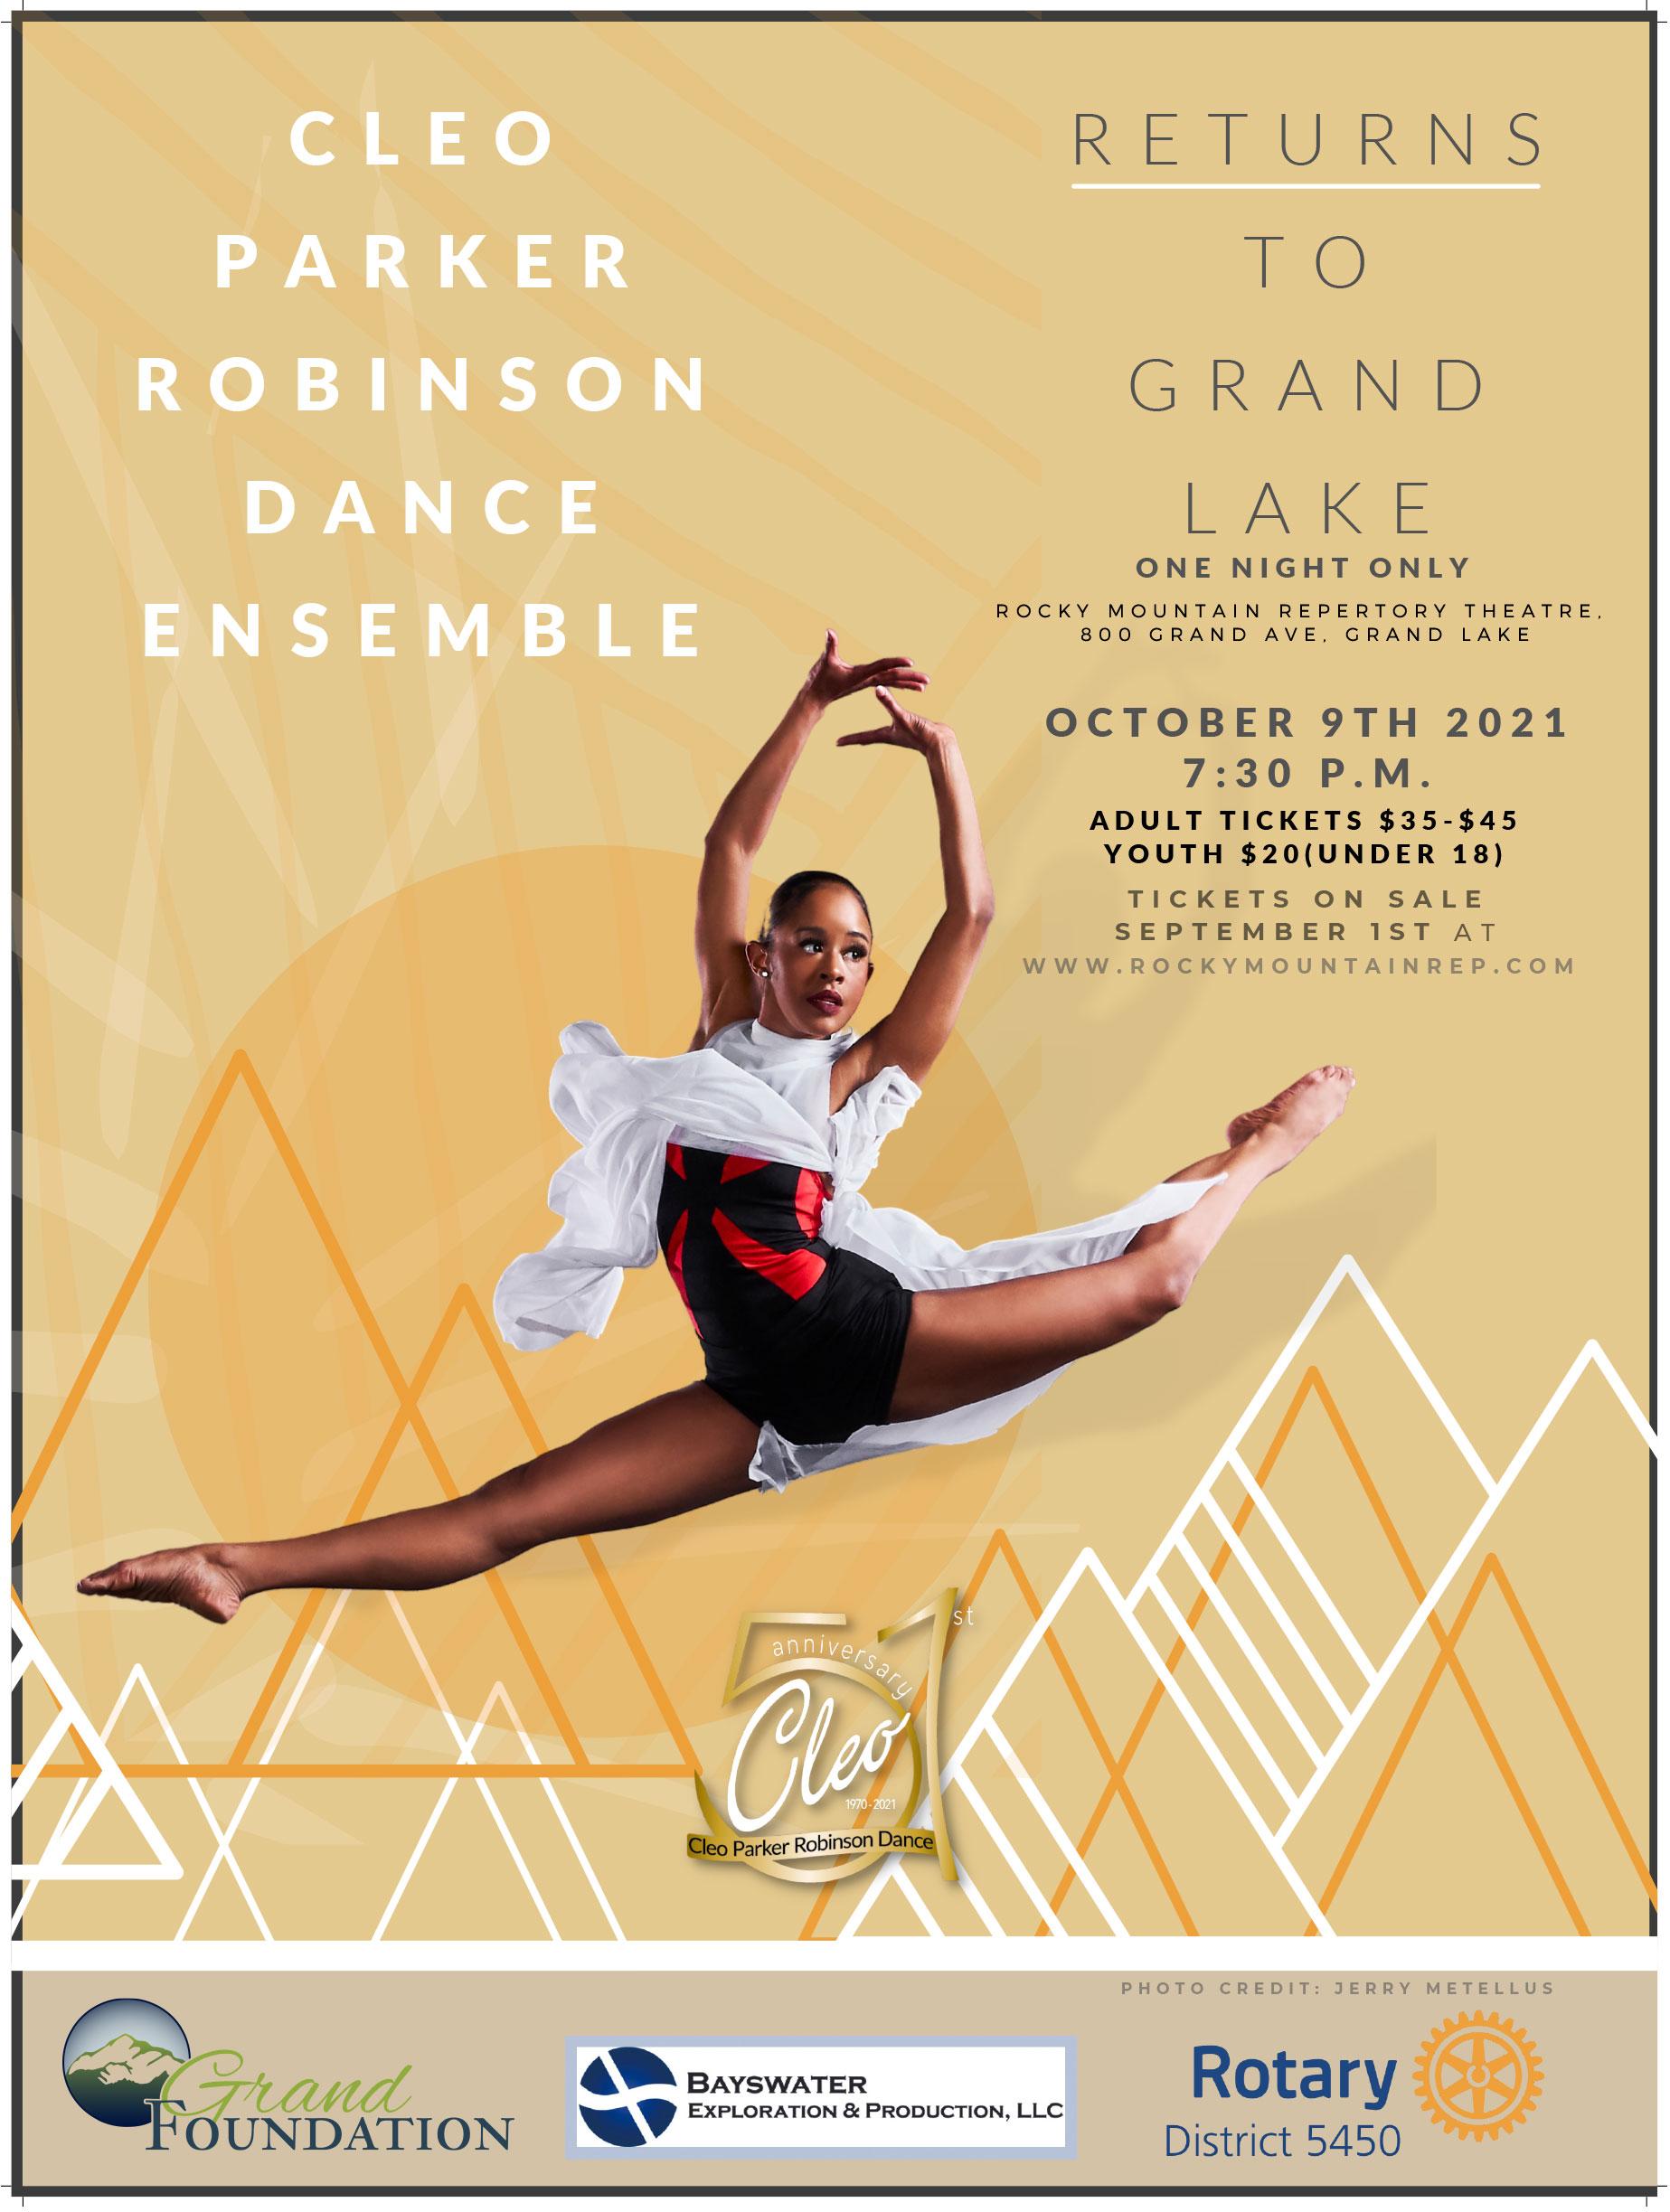 Cleo Parker Robinson Dance